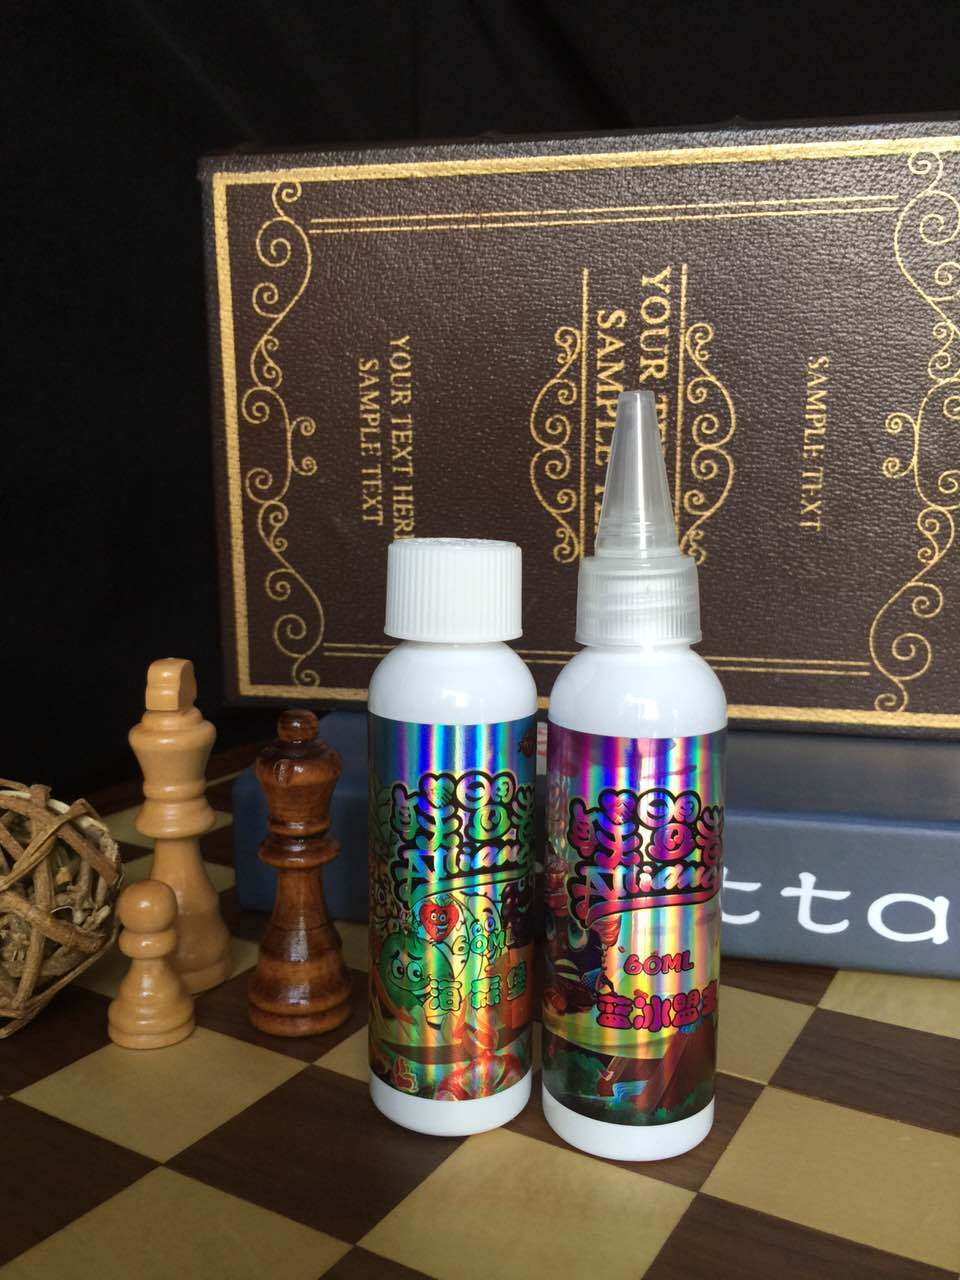 Lmz Net E-Liquids with 0mg Nicotine in 60ml Health Bottle